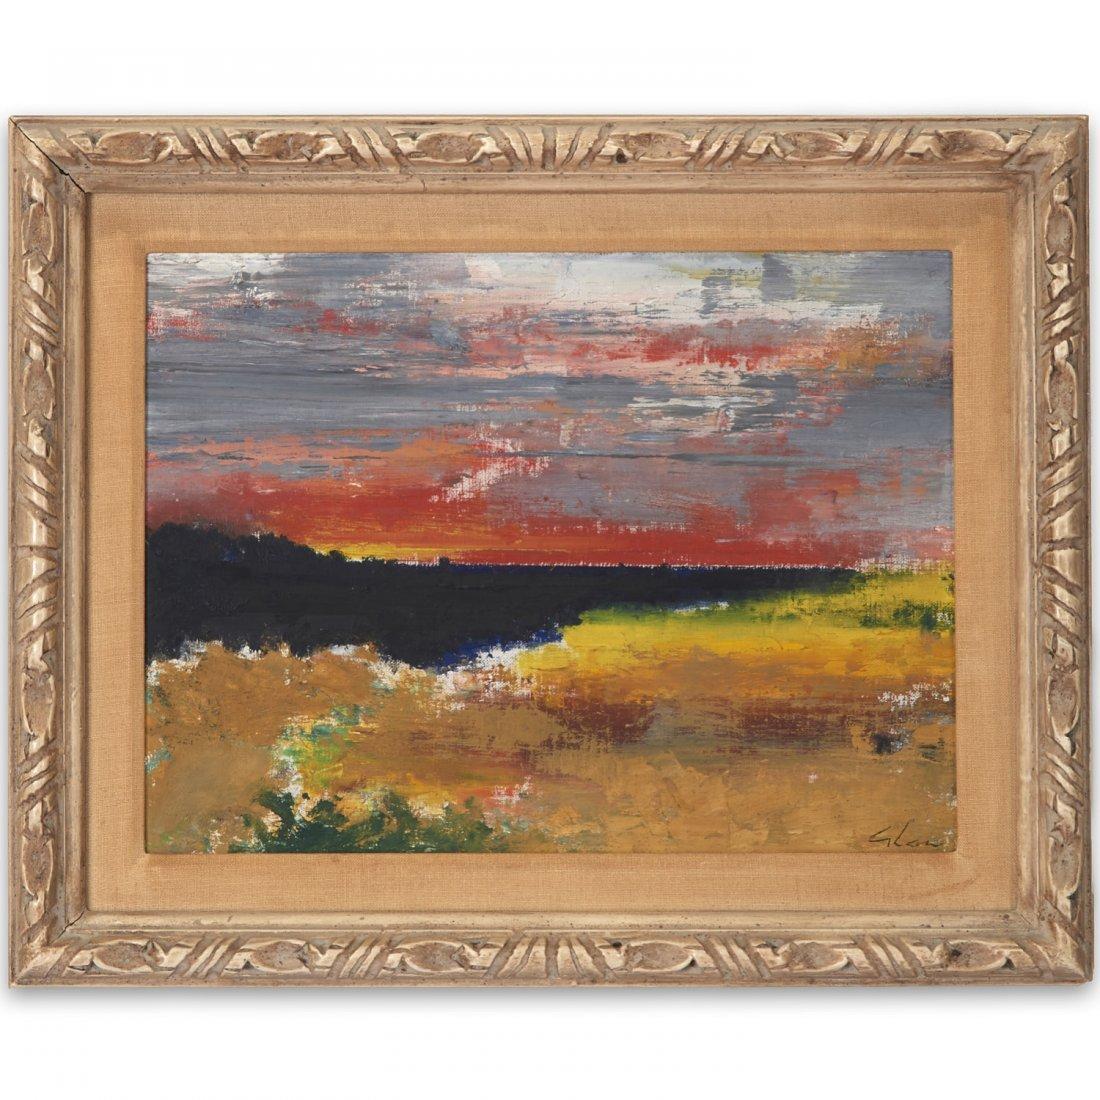 Charles Green Shaw, painting